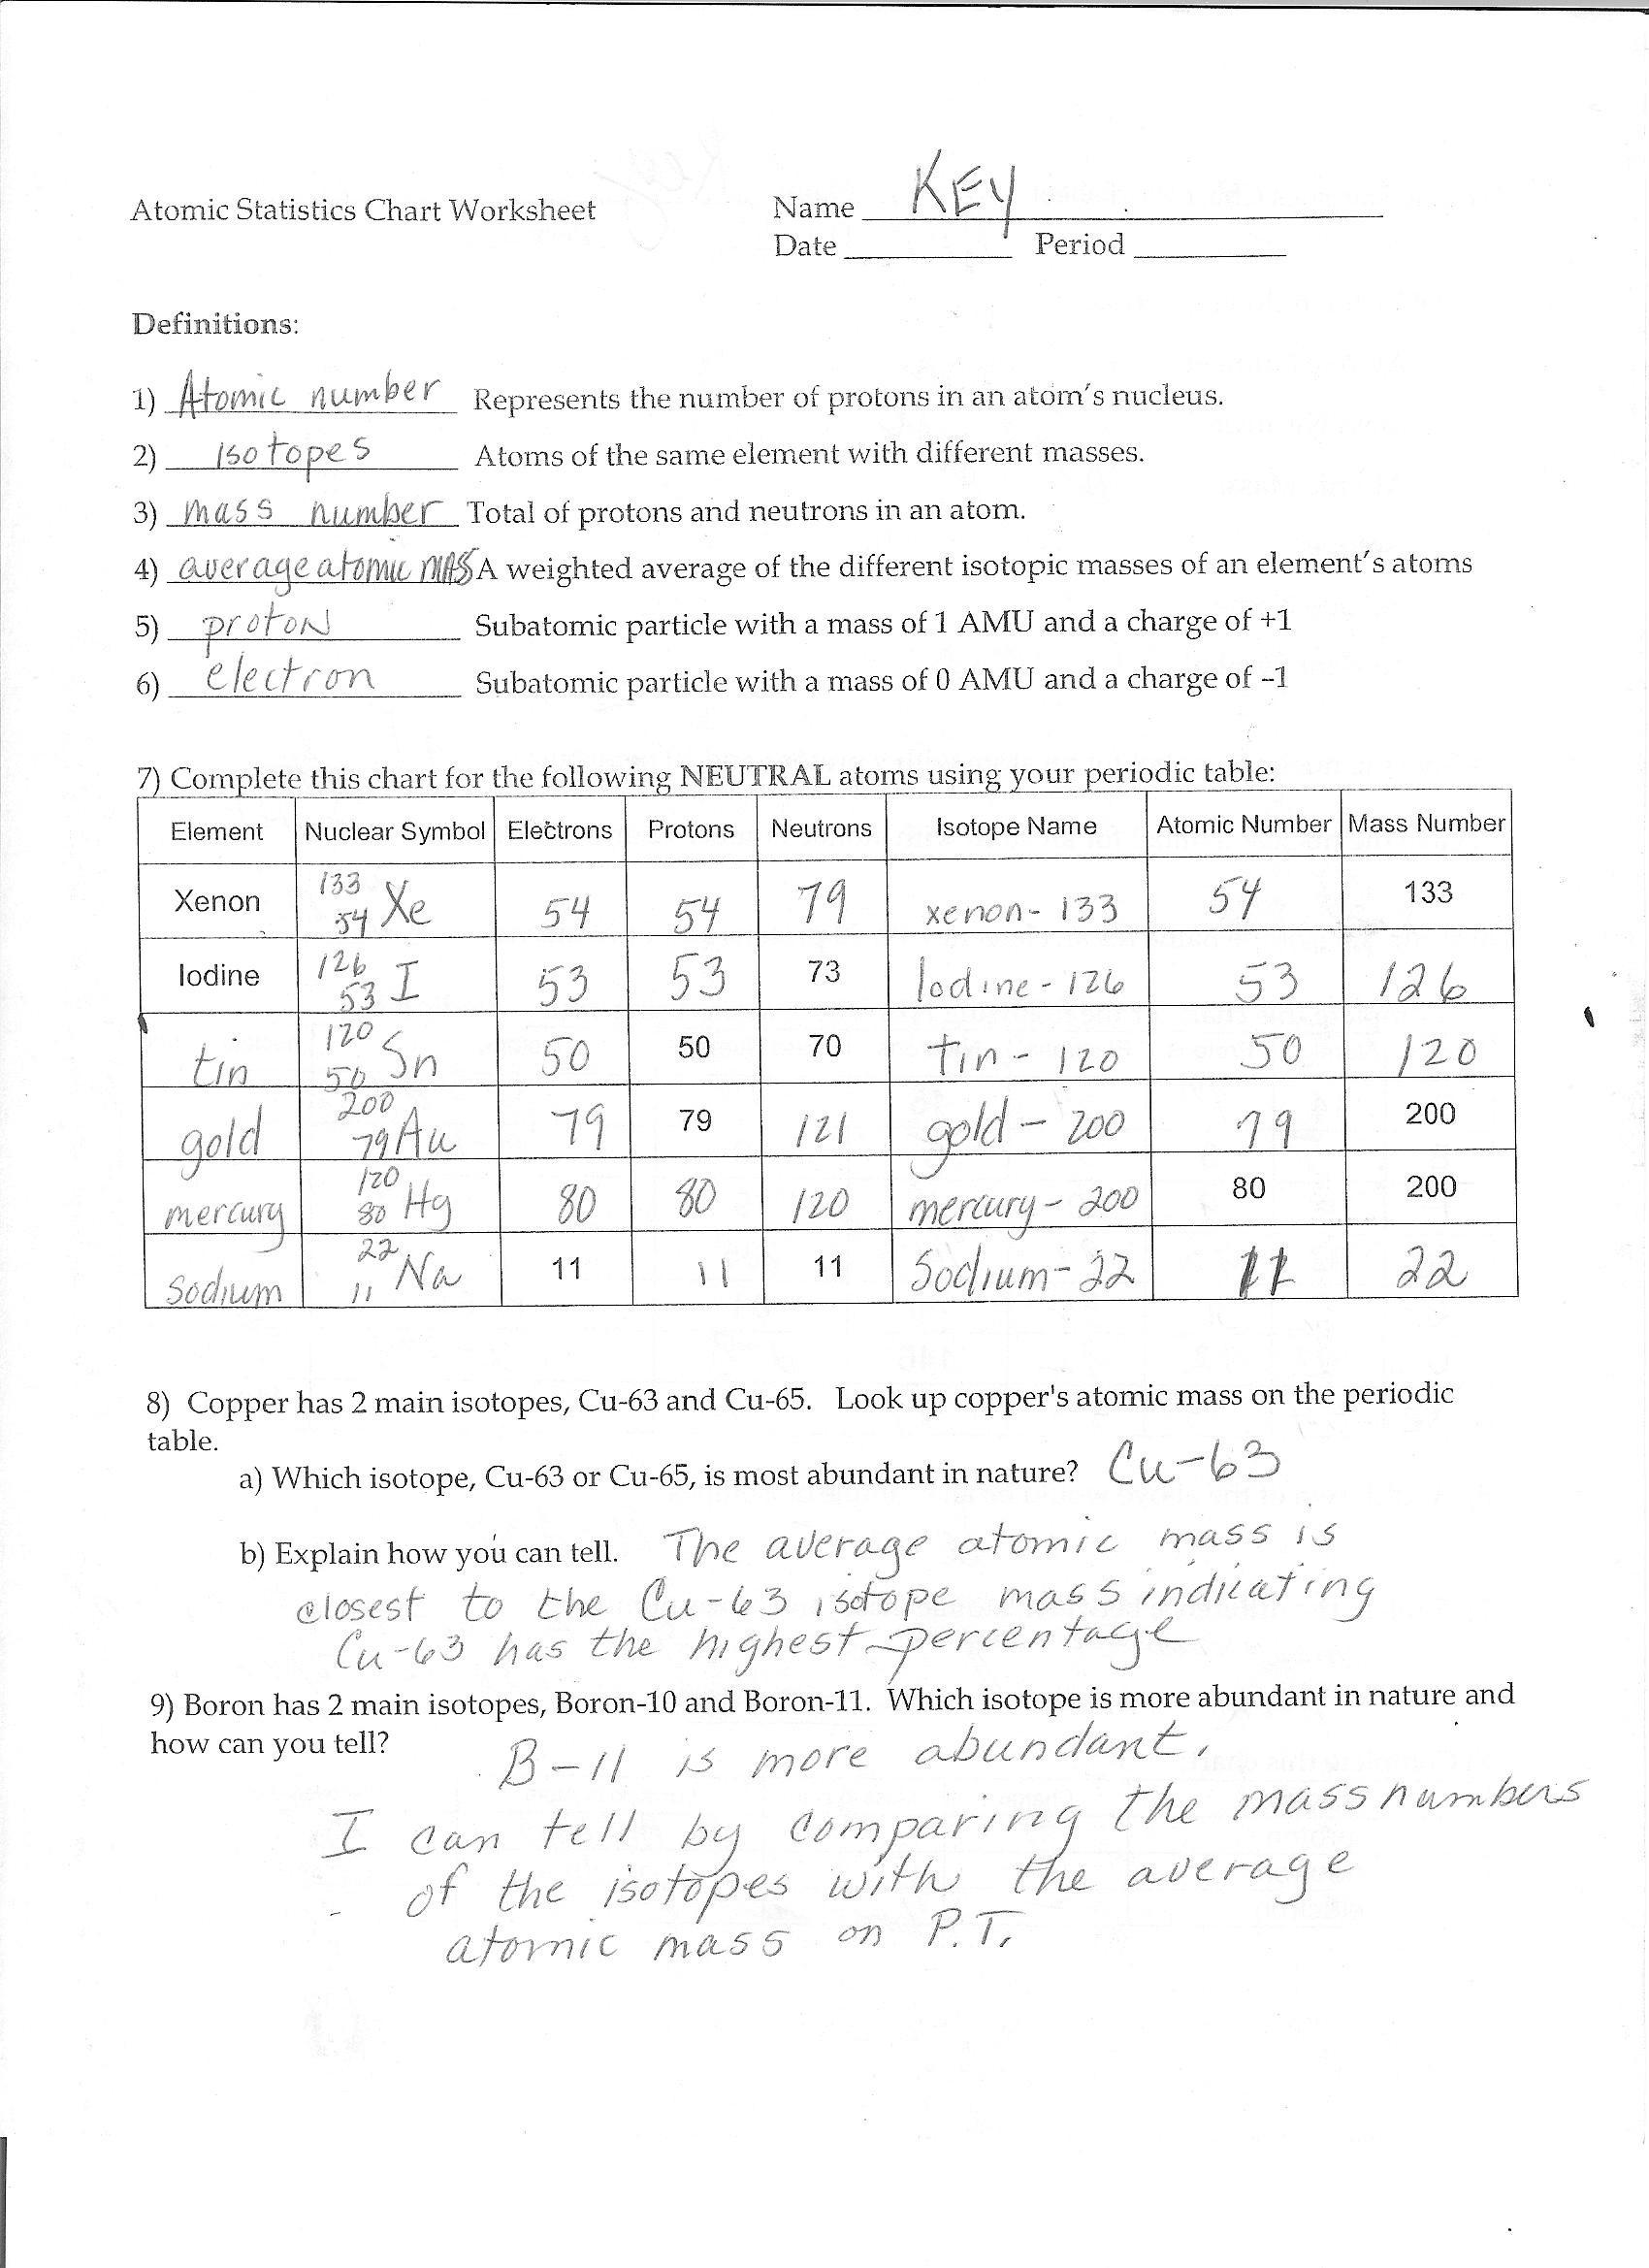 Atomic Structure Worksheet Answer Key Worksheet Development atomic theory Answers